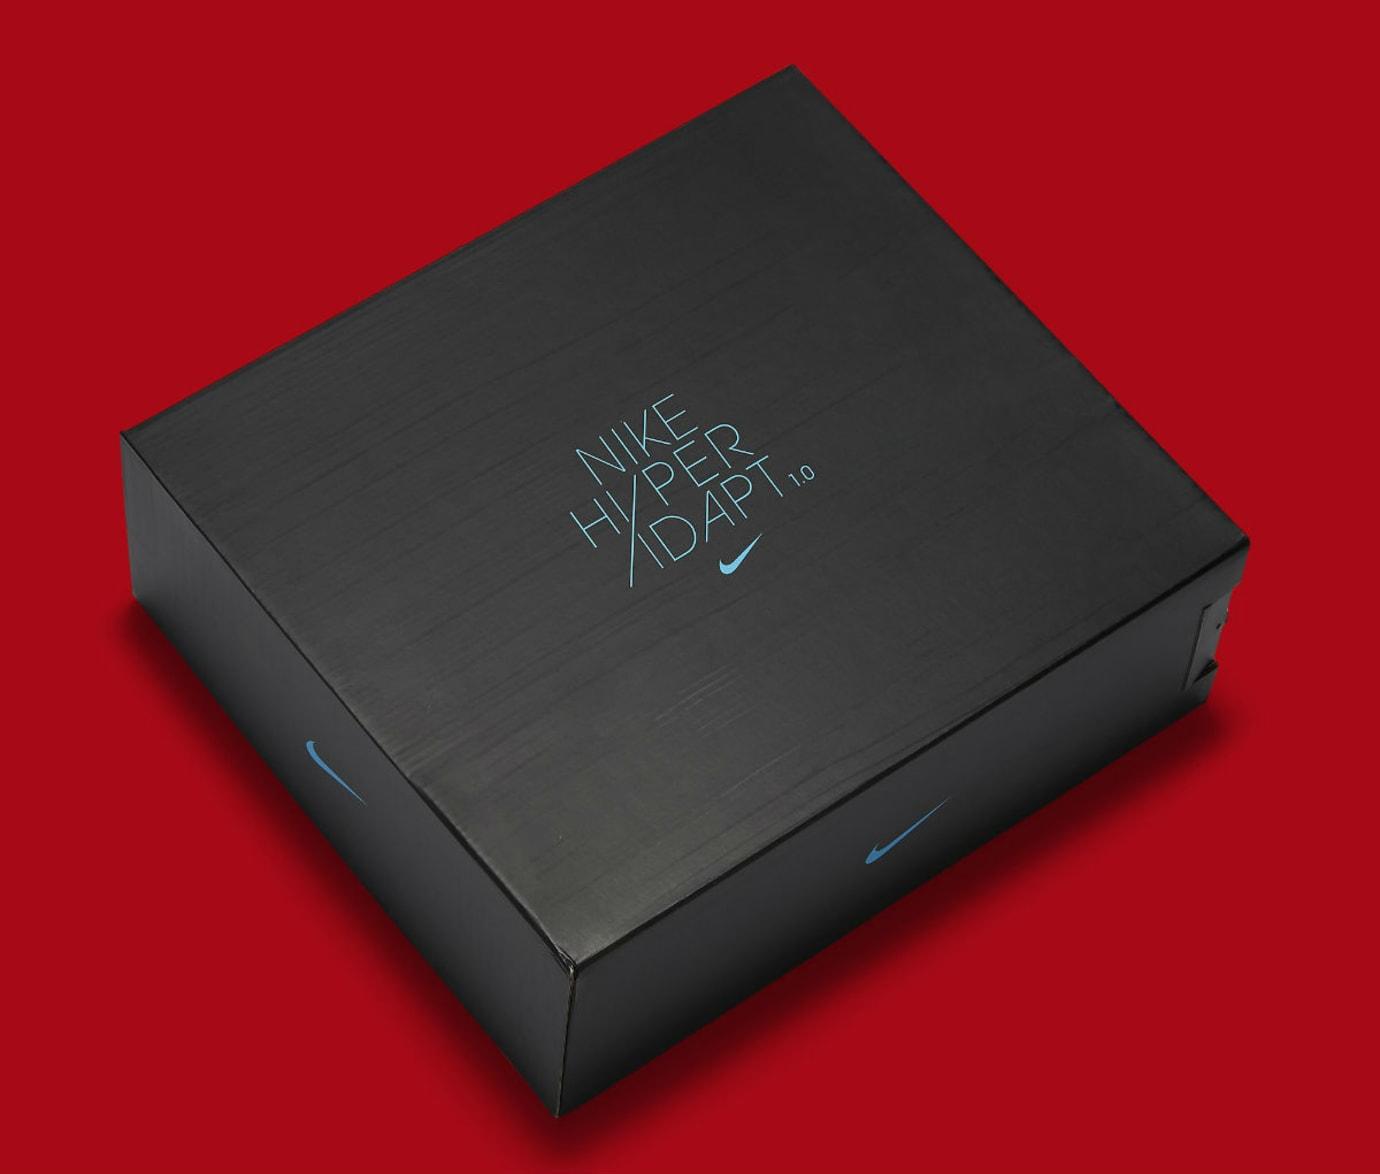 Nike HyperAdapt 1.0 Habanero Red Release Date 843871-600 Box